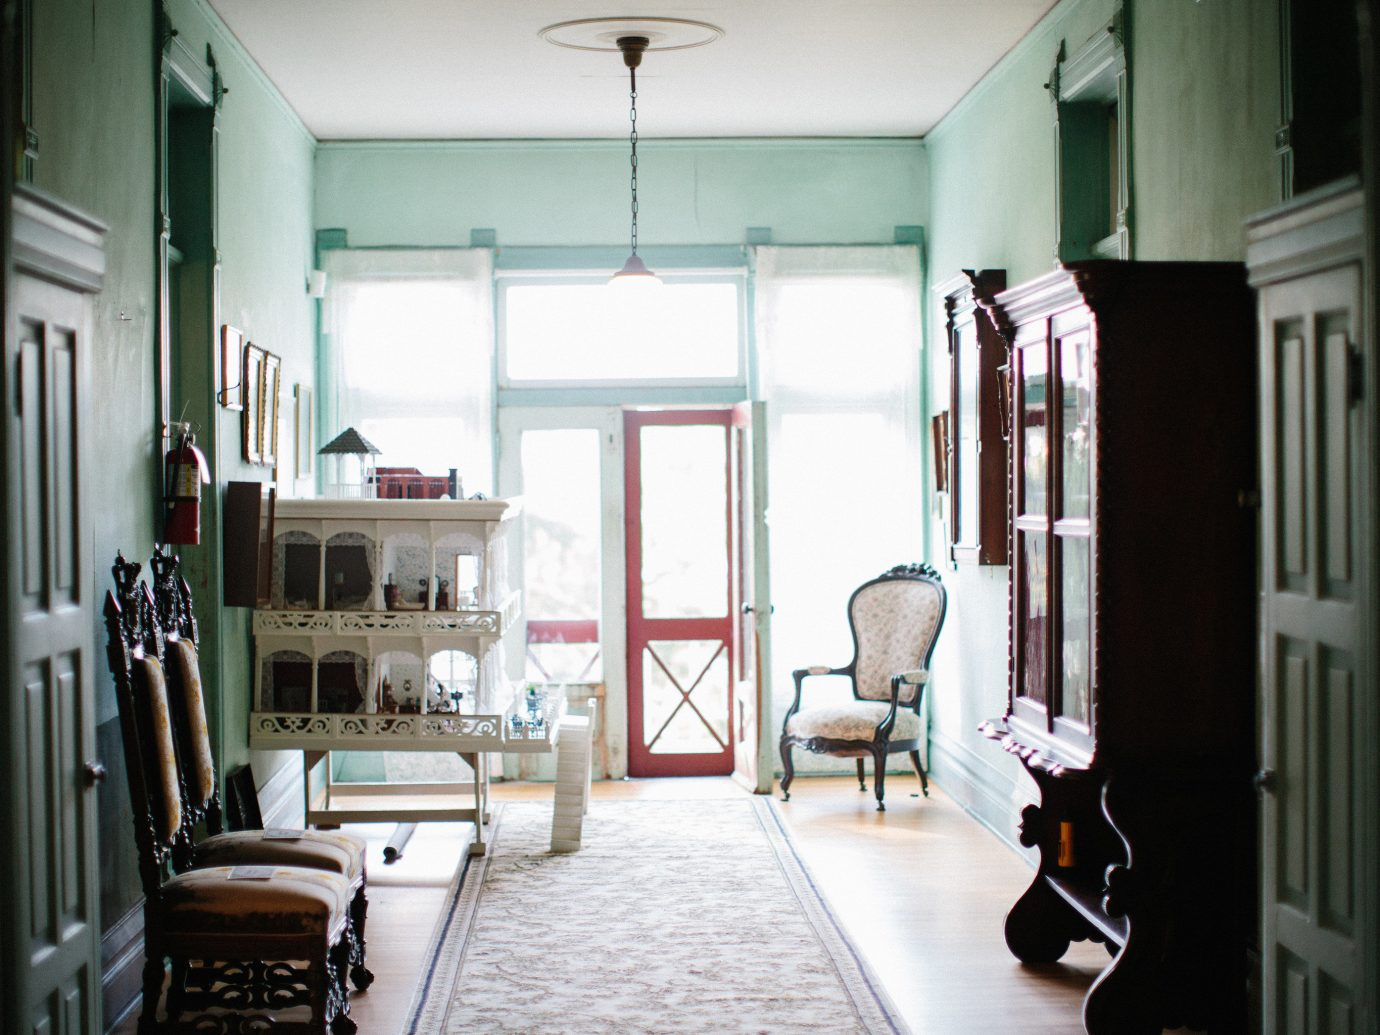 Trip Ideas Weekend Getaways floor indoor chair room interior design Living home window house furniture living room